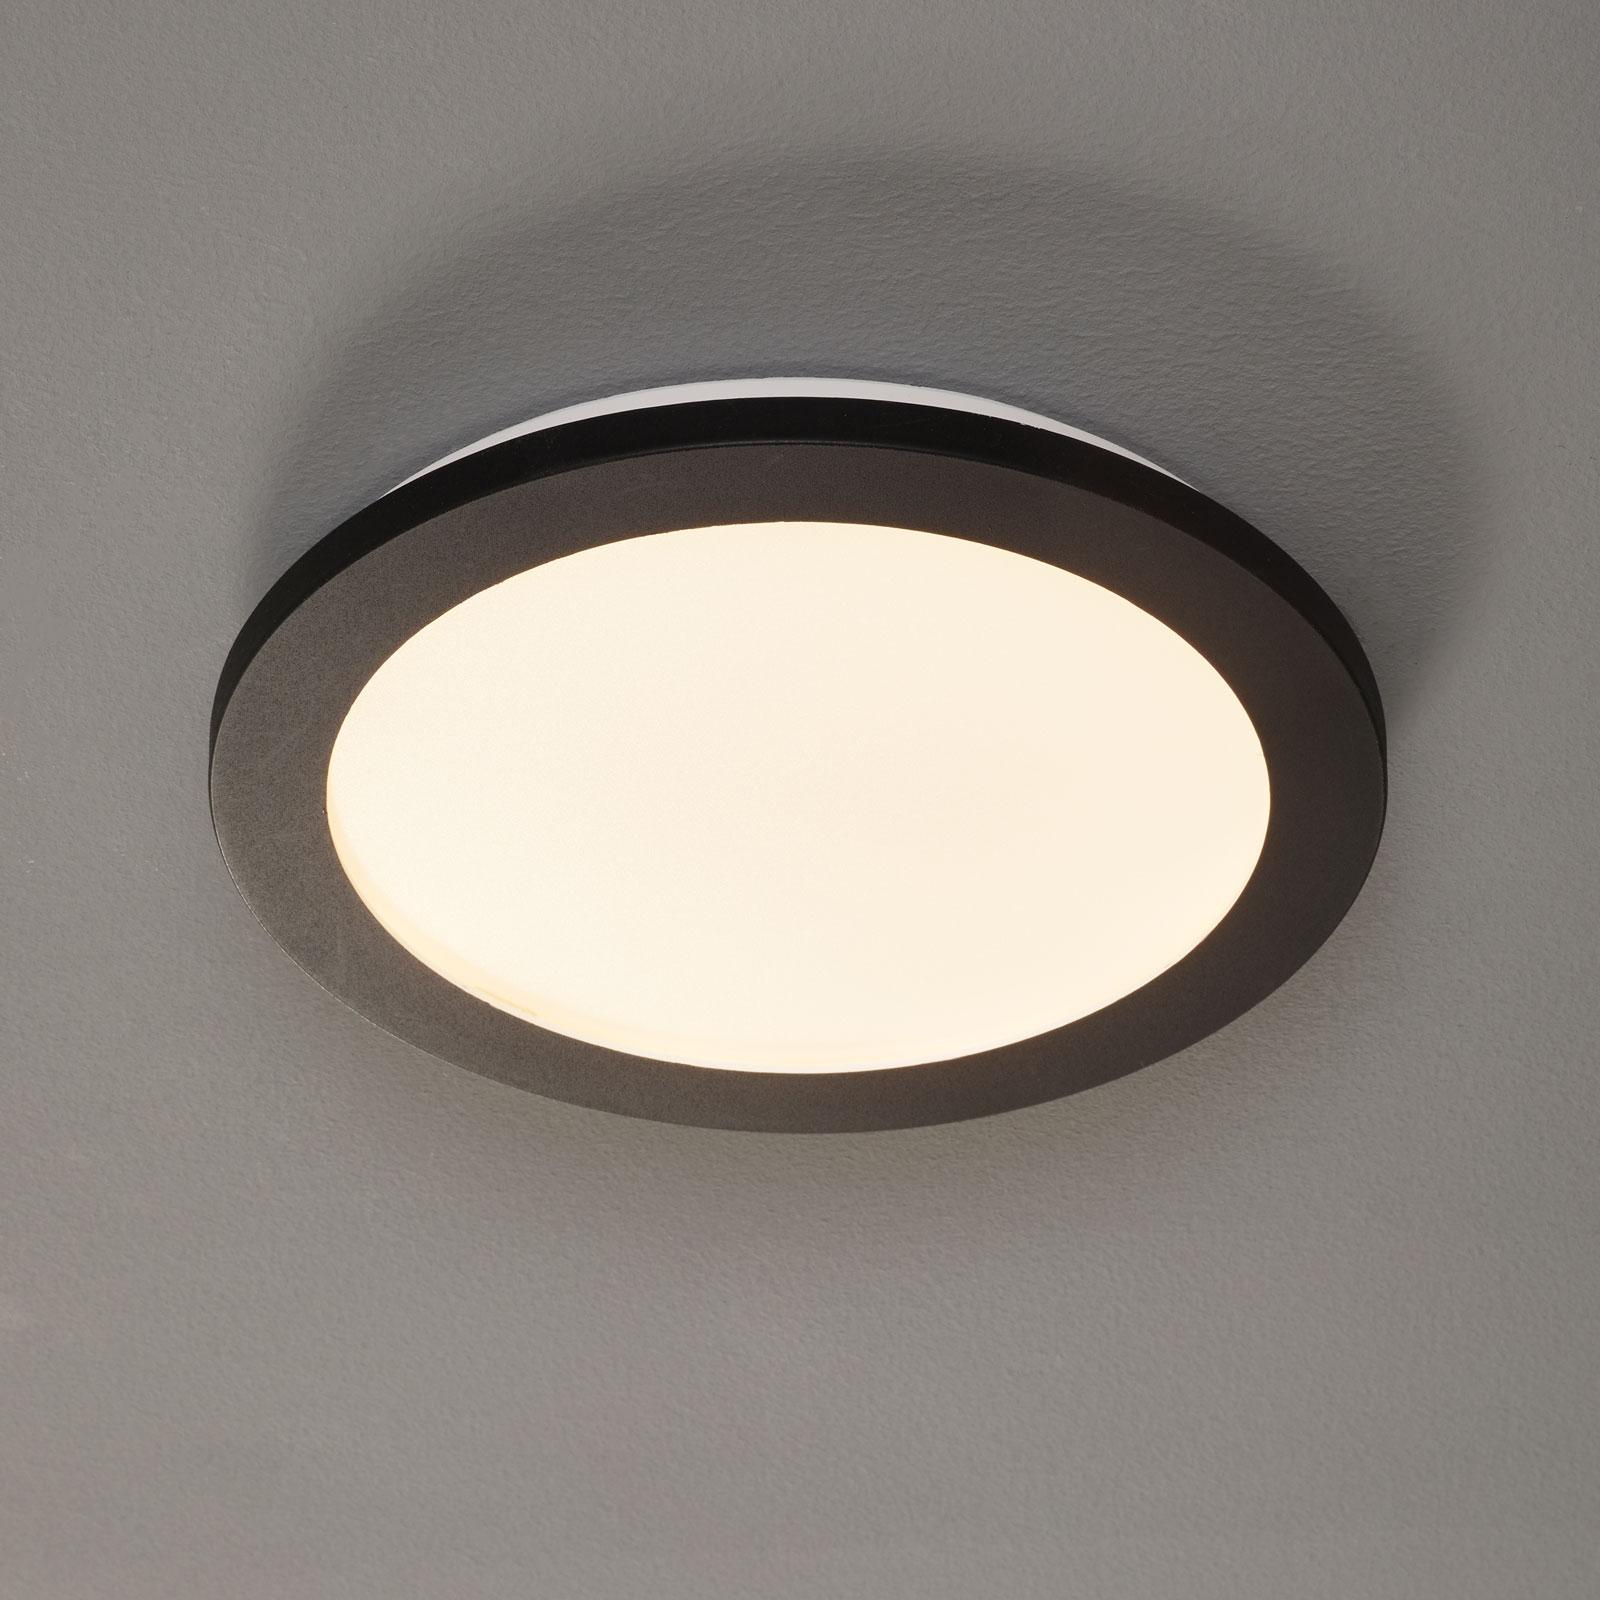 LED-taklampe Camillus, rund, Ø 26 cm